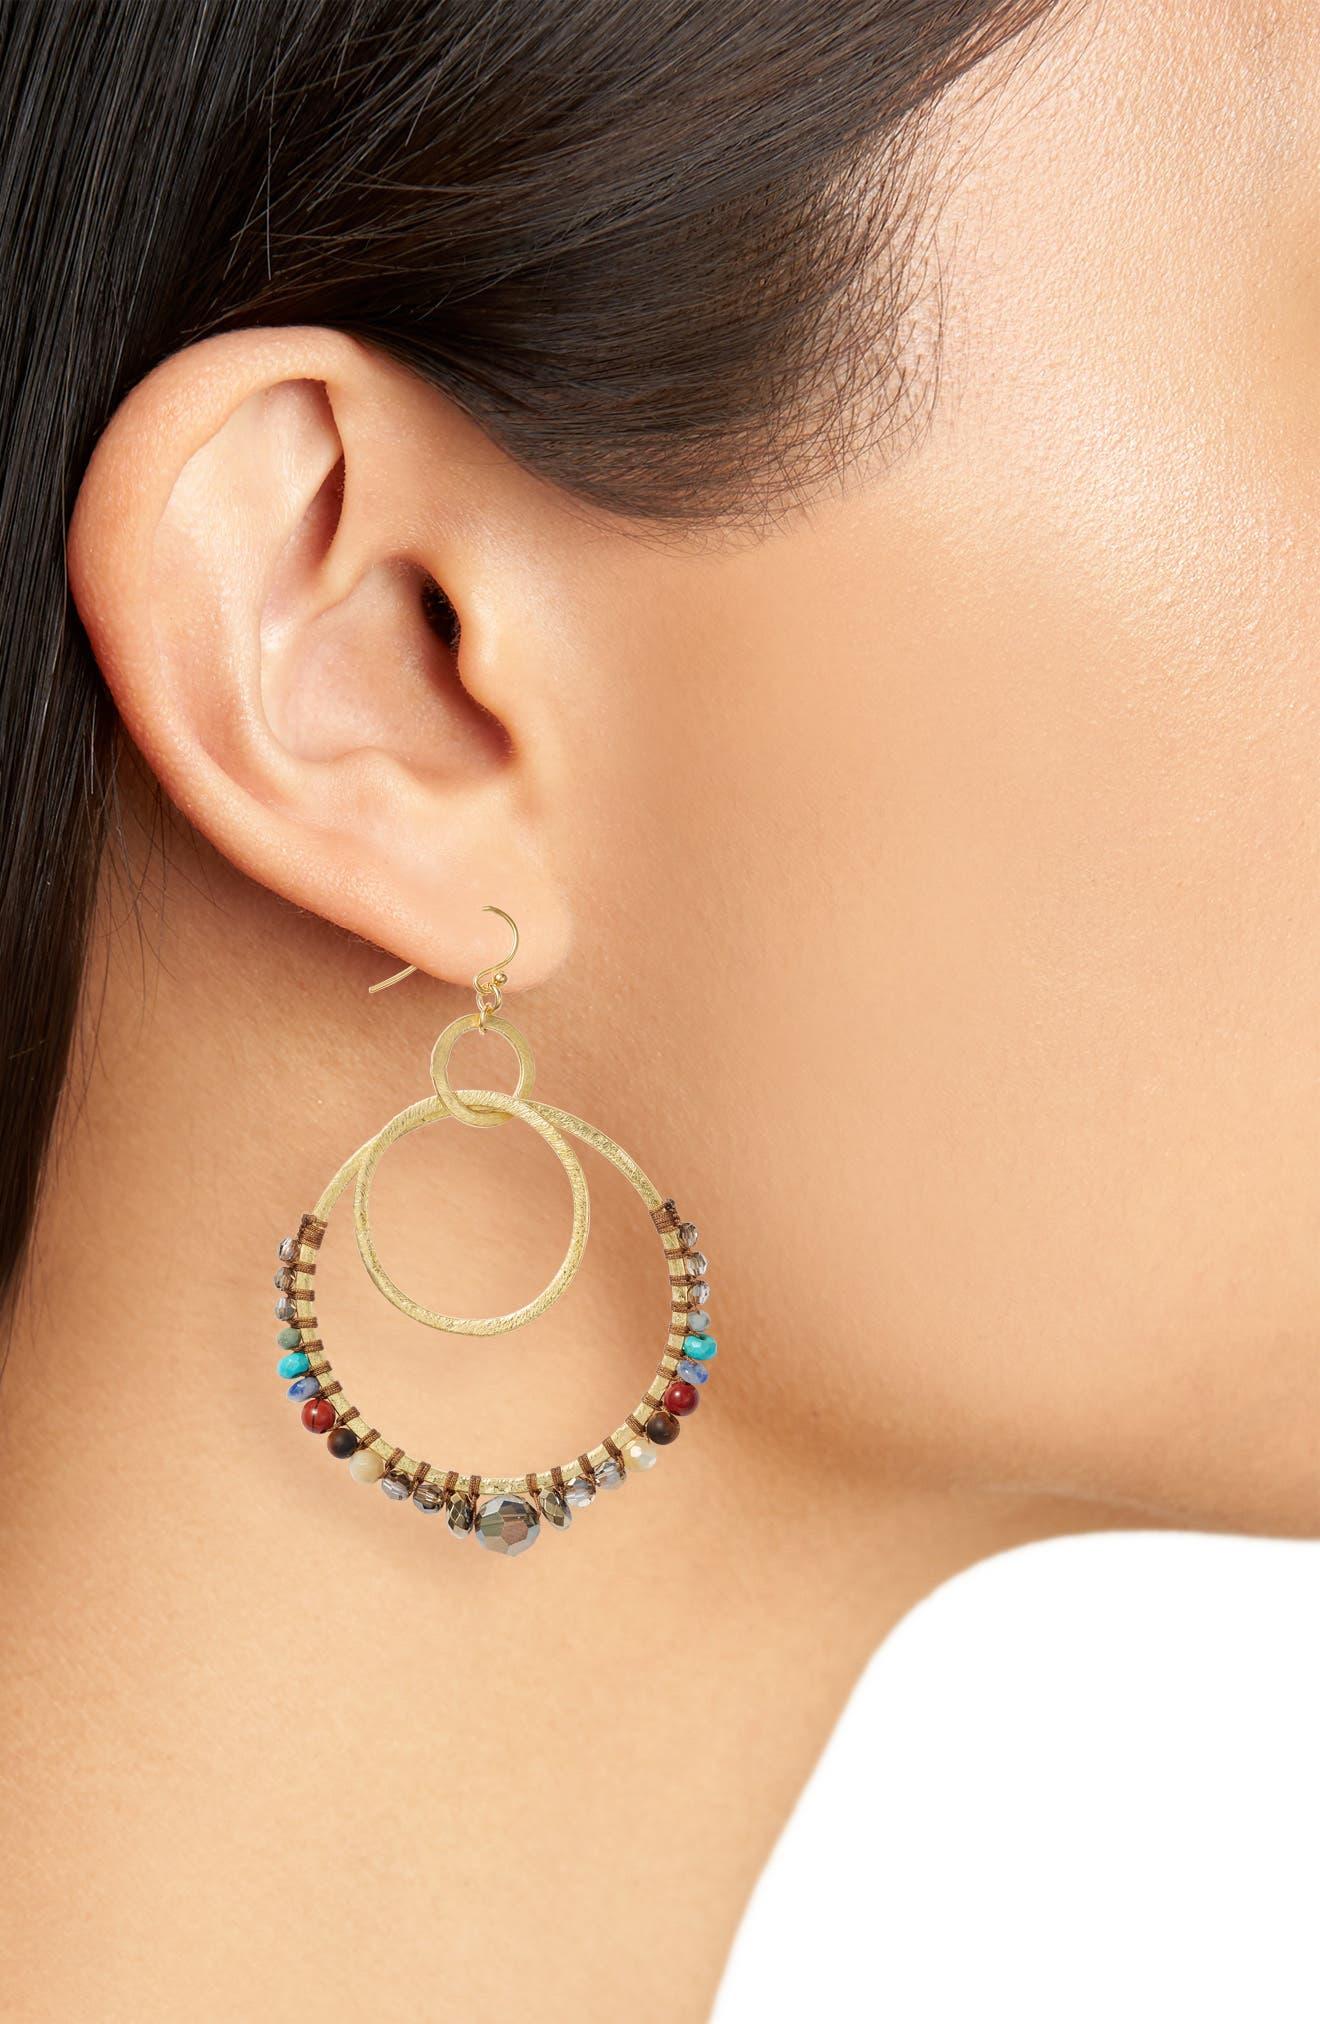 Beaded Double Hoop Earrings,                             Alternate thumbnail 2, color,                             BEIGE MULTI MIX